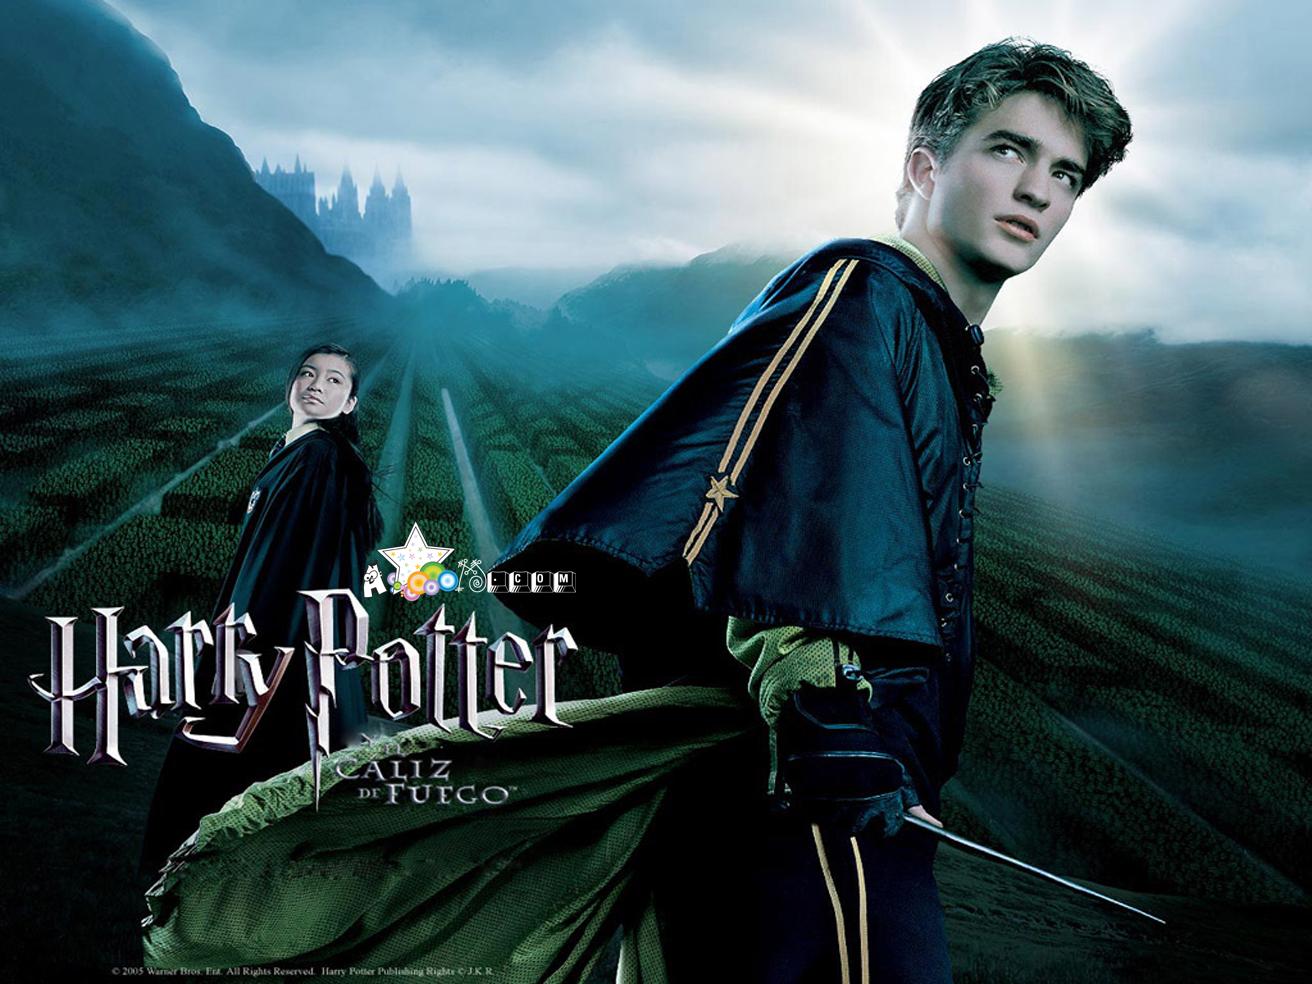 http://4.bp.blogspot.com/-MtYbZyIttjo/T-ya-syWRcI/AAAAAAAAAmc/vi--kXd8J2U/s1600/Miscellaneous+Harry+Potter+15+Harry+Potter+Wallpapers+Cedric+Diggory+y+Cho+Chang.jpg